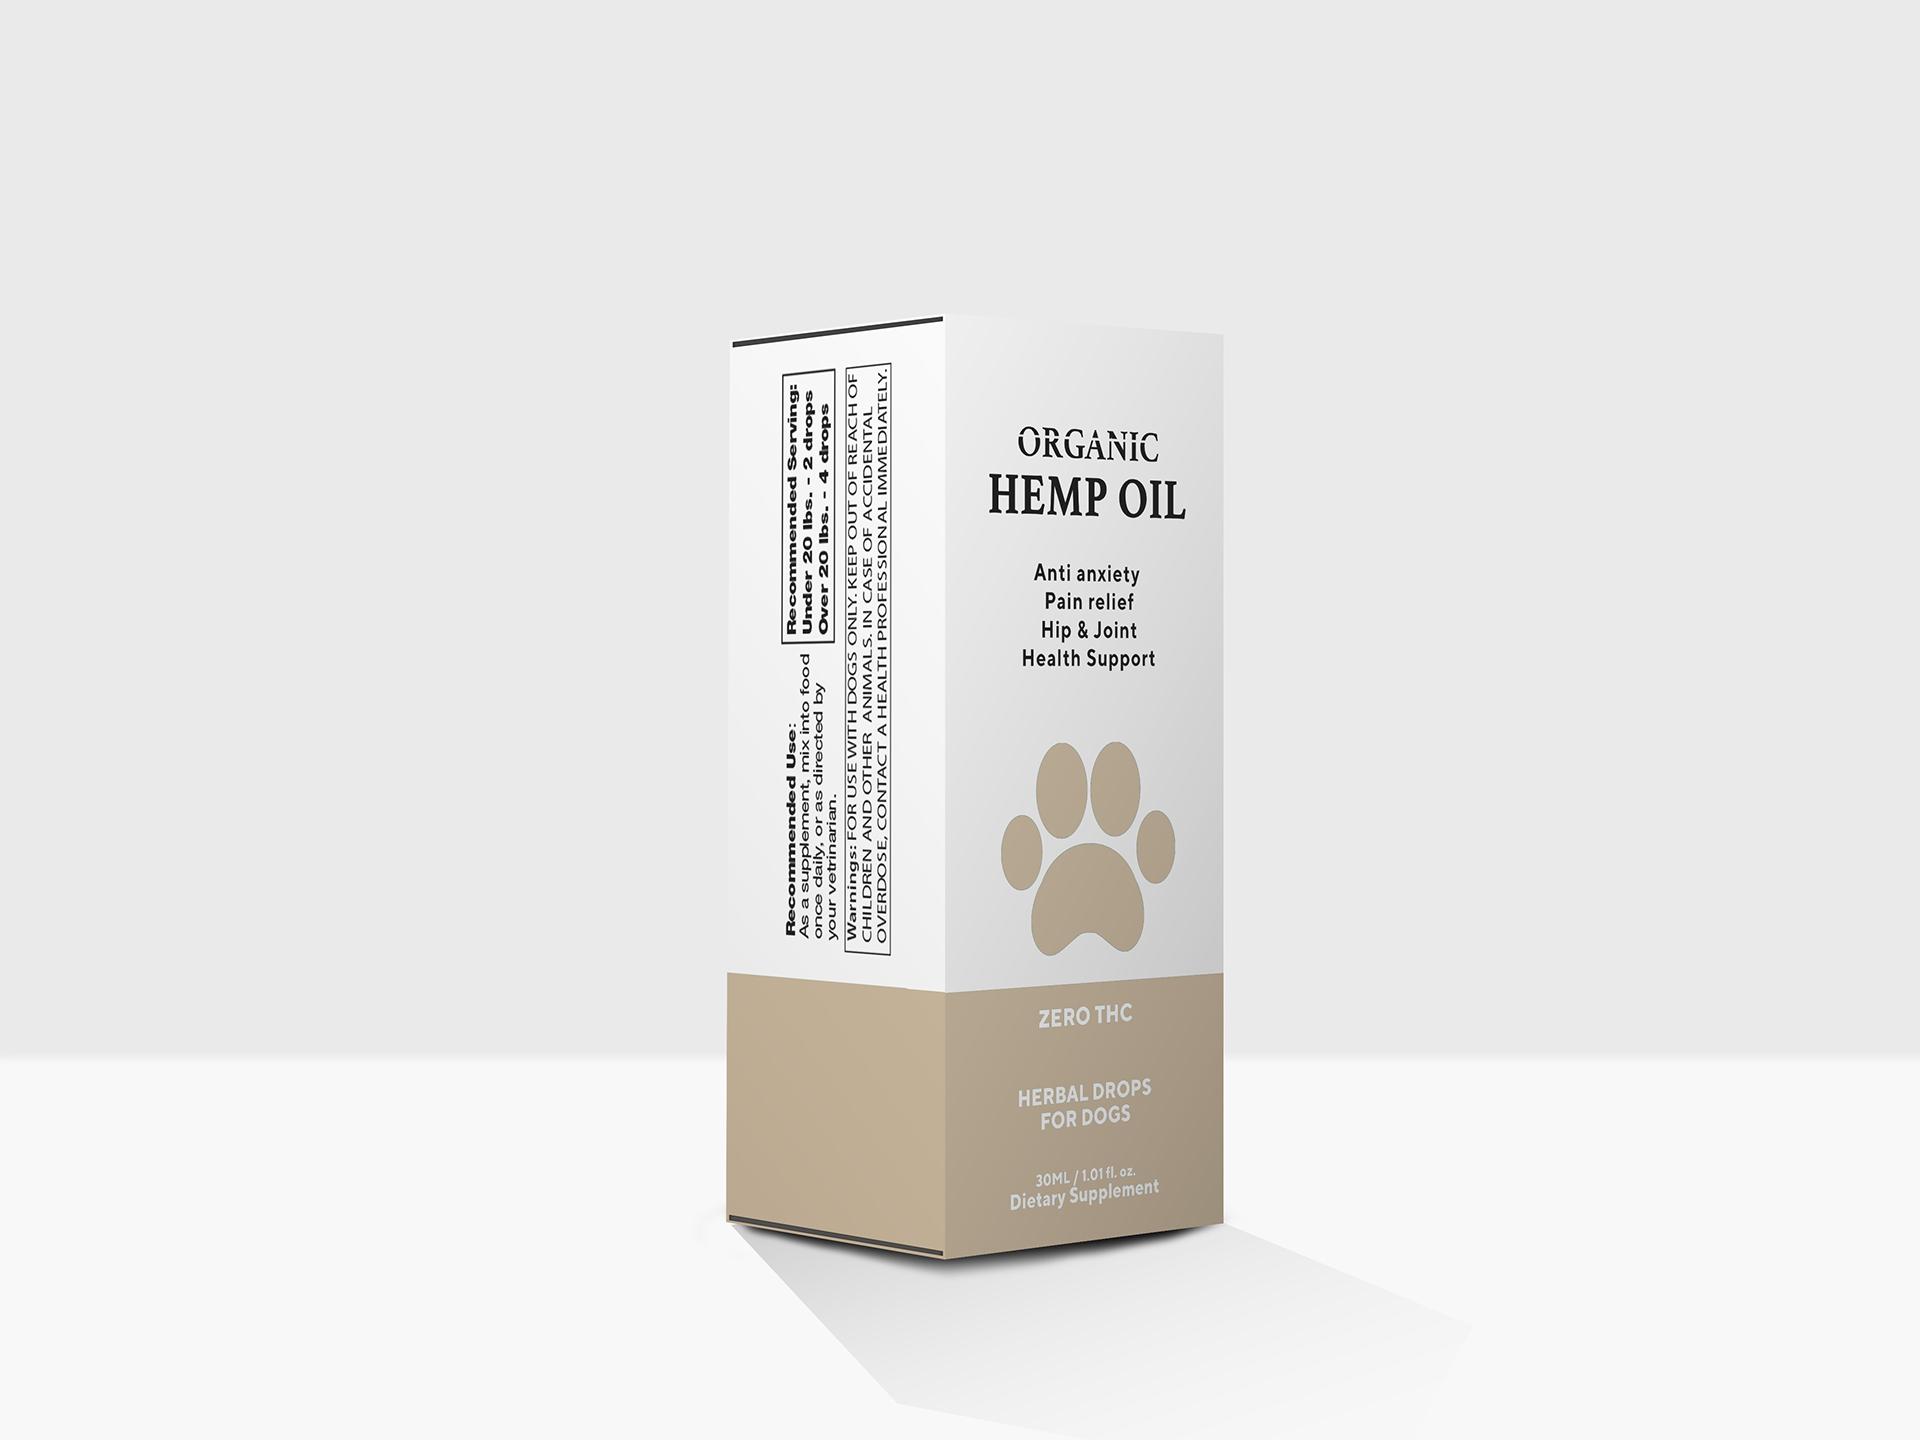 Hemp Oil design by Sen